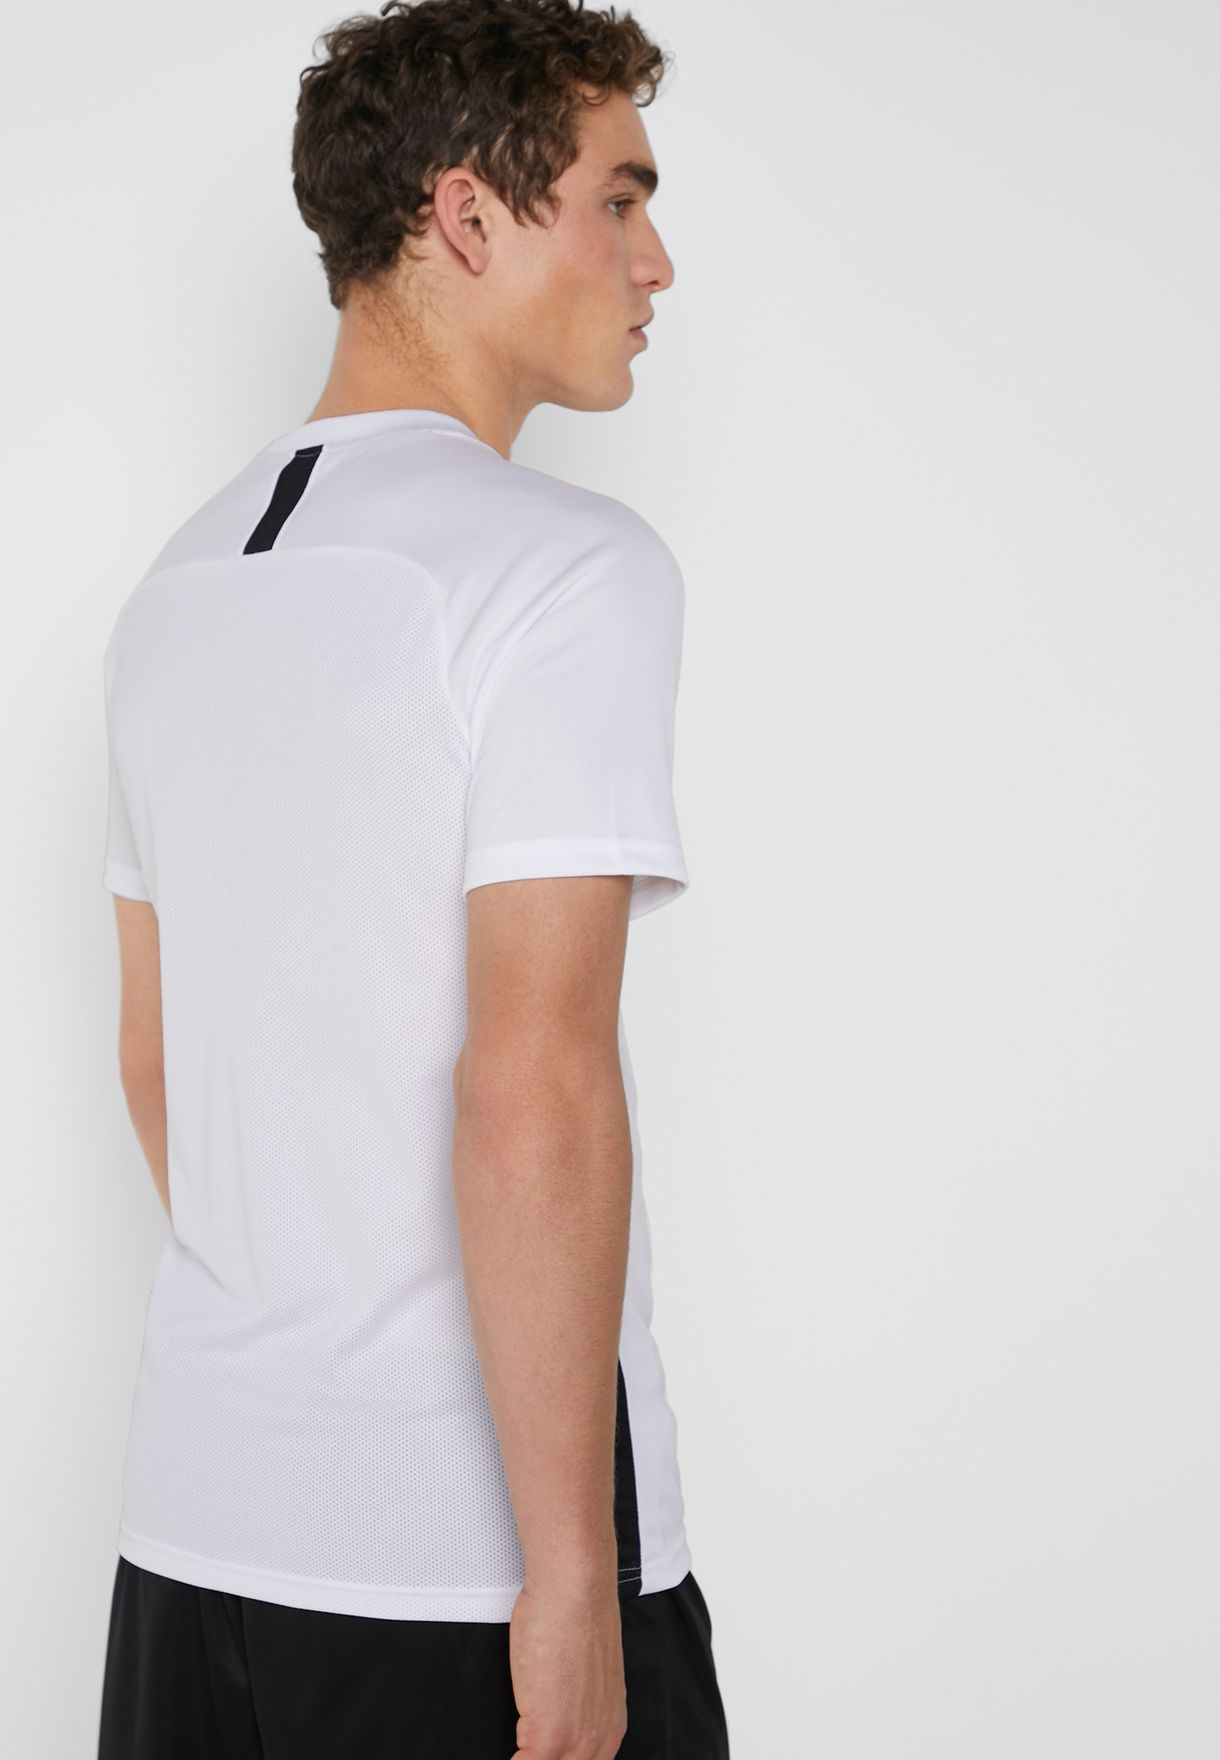 Dri-FIT Academy T-Shirt